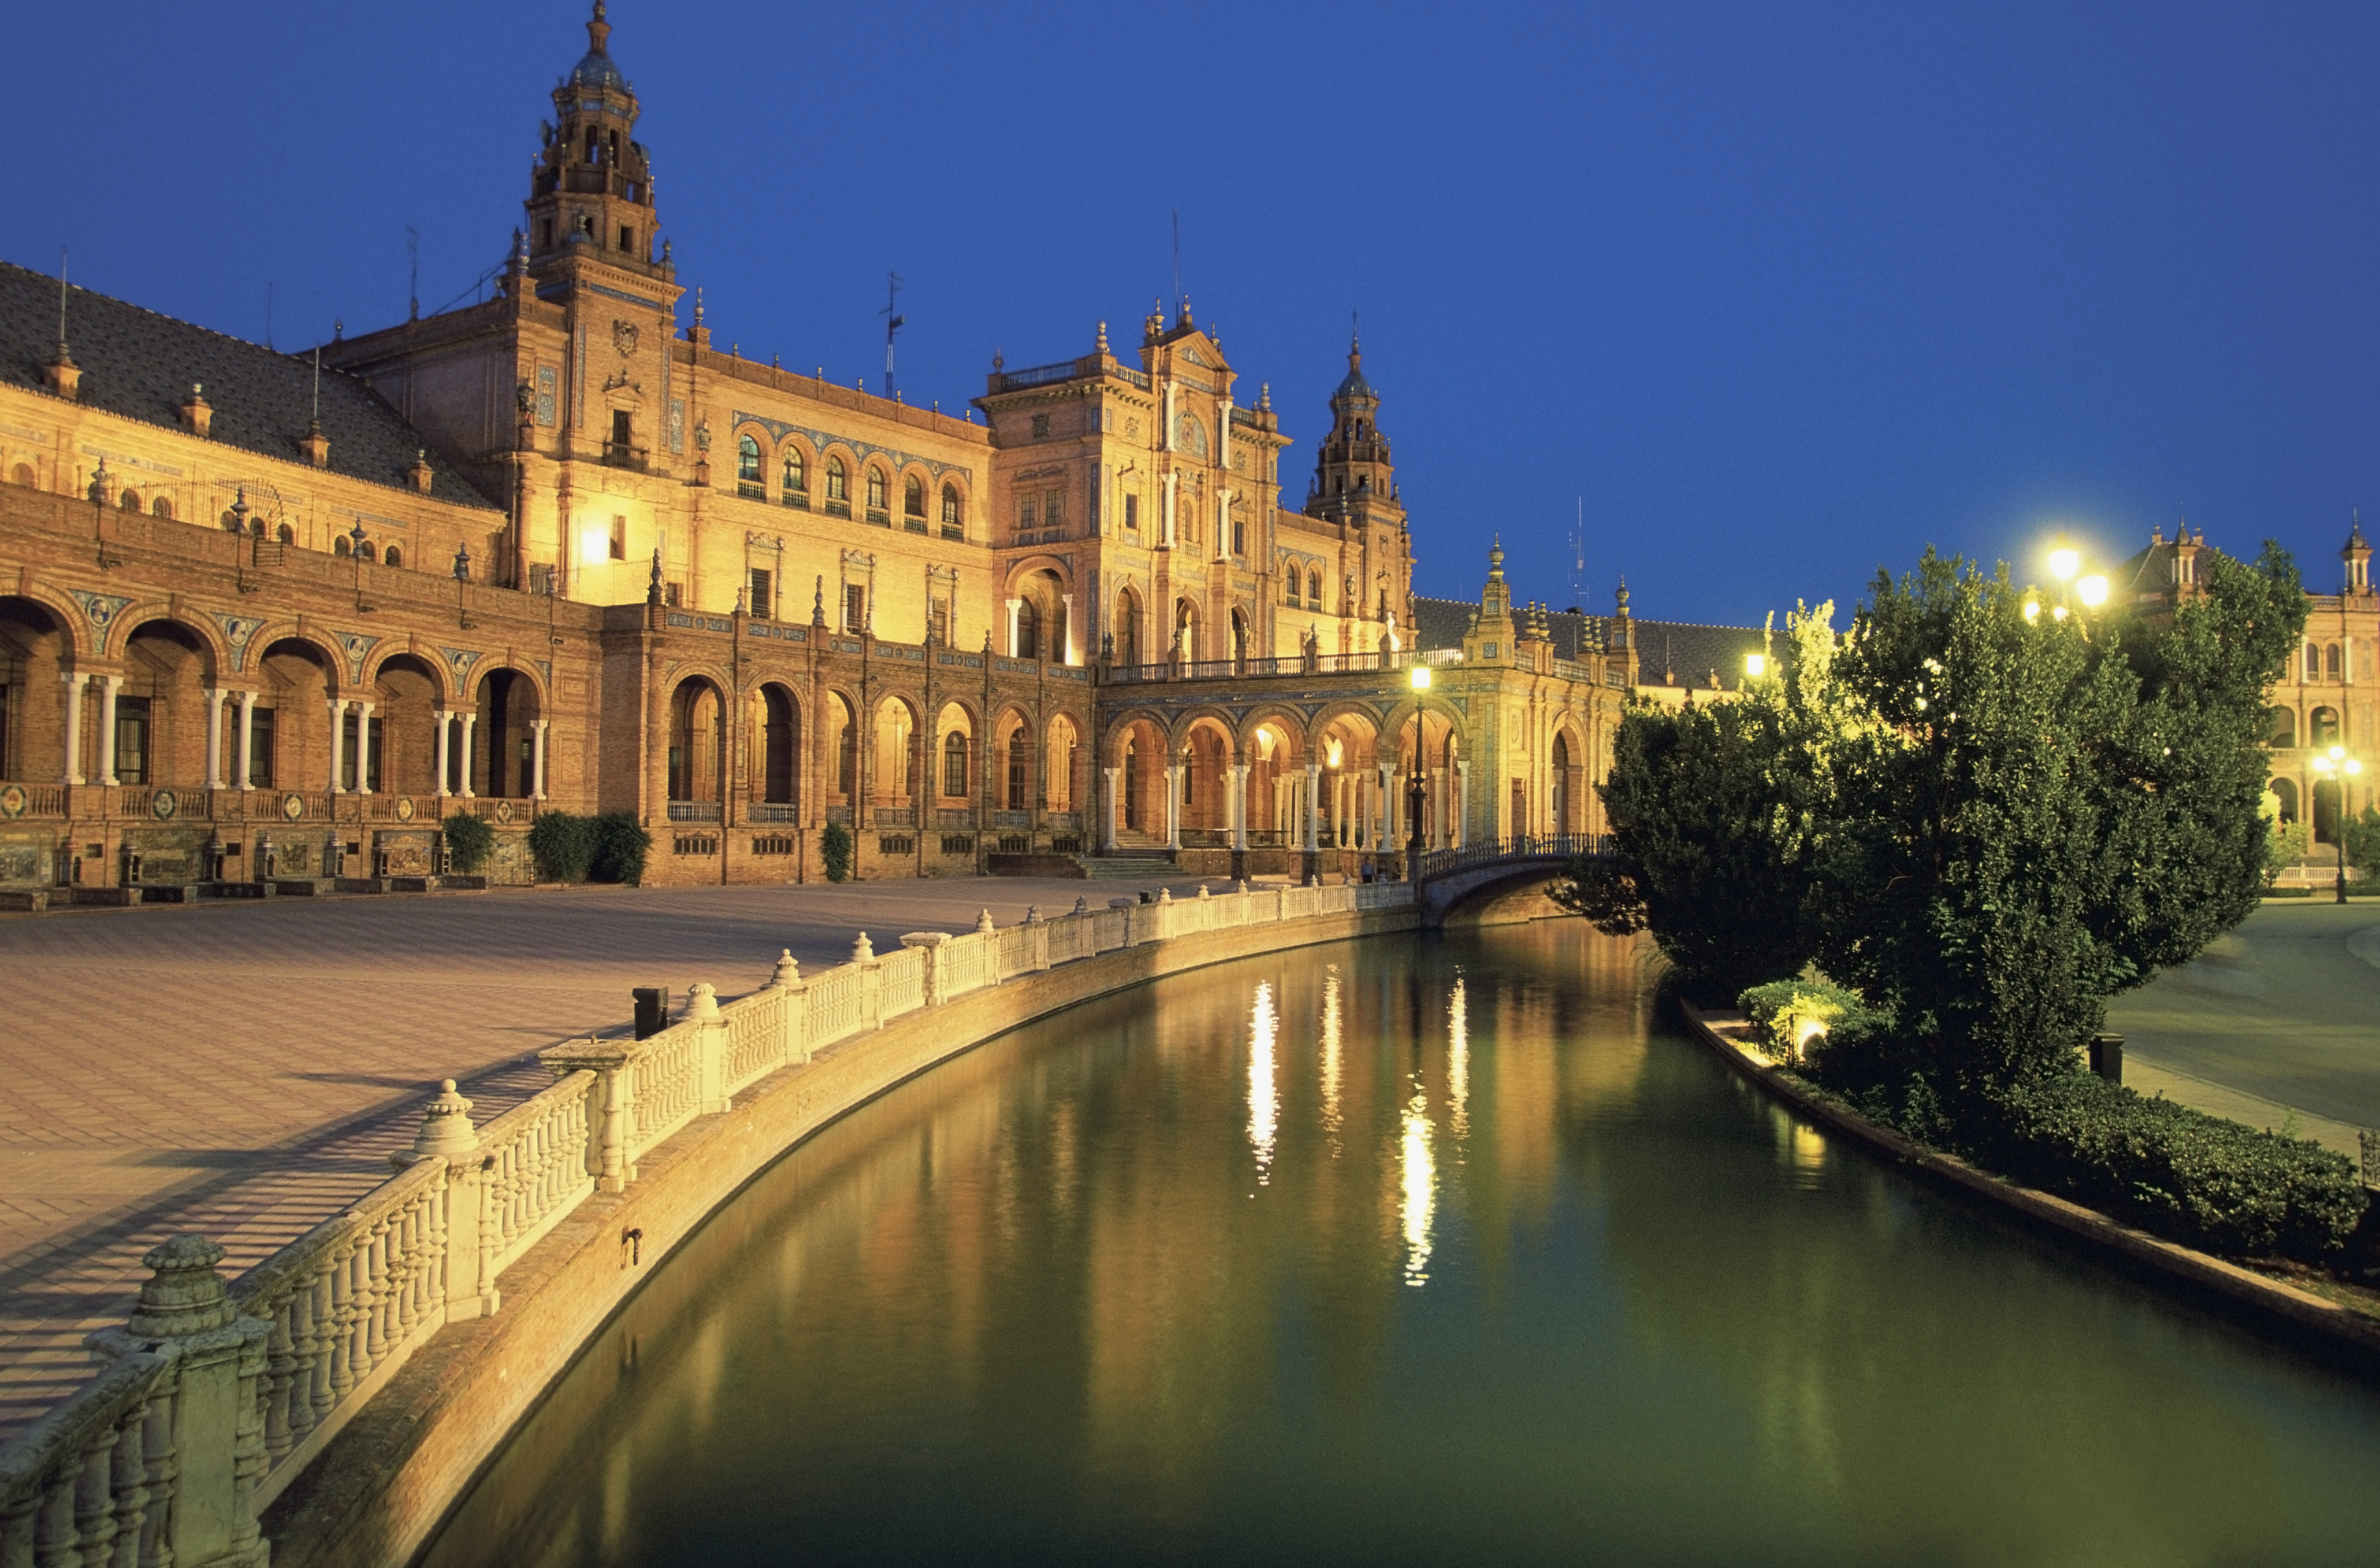 Plaza de Espana Square in Seville, Spain